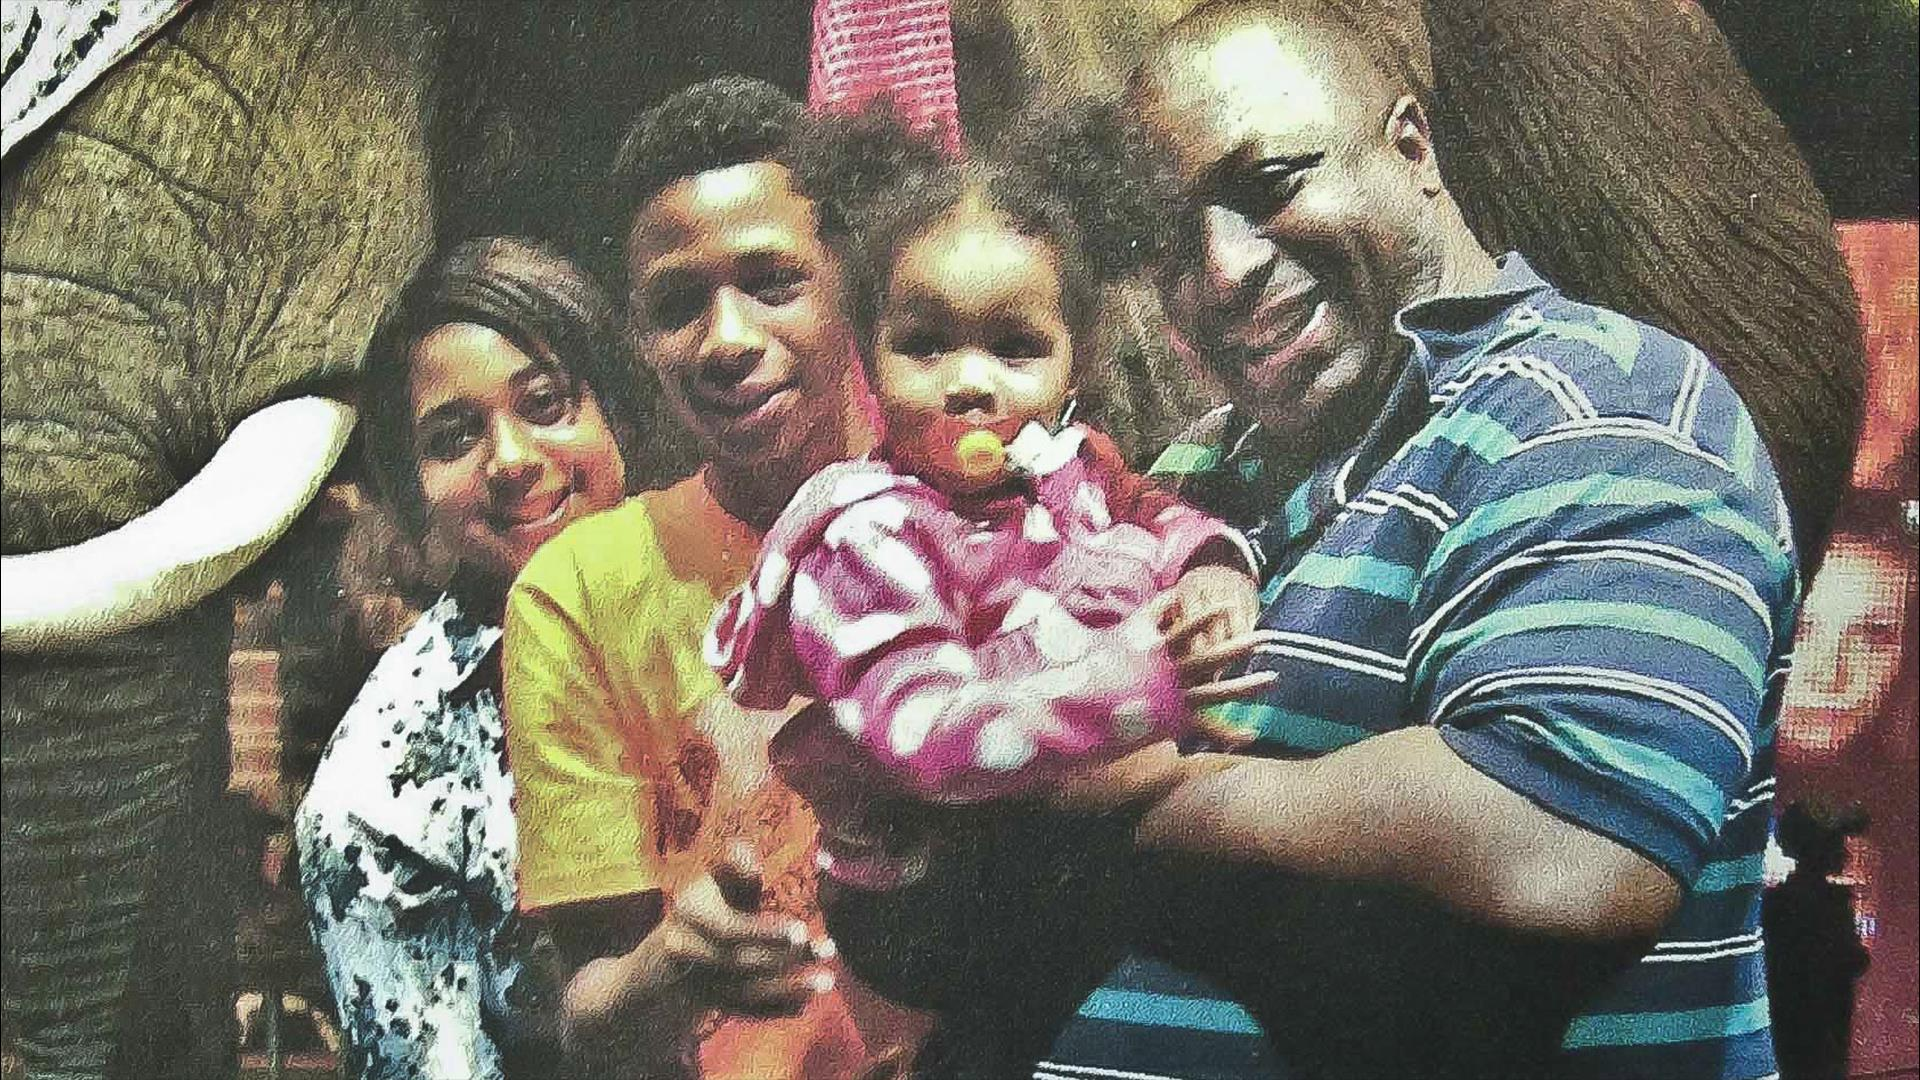 Sources: No indictment in Garner death case